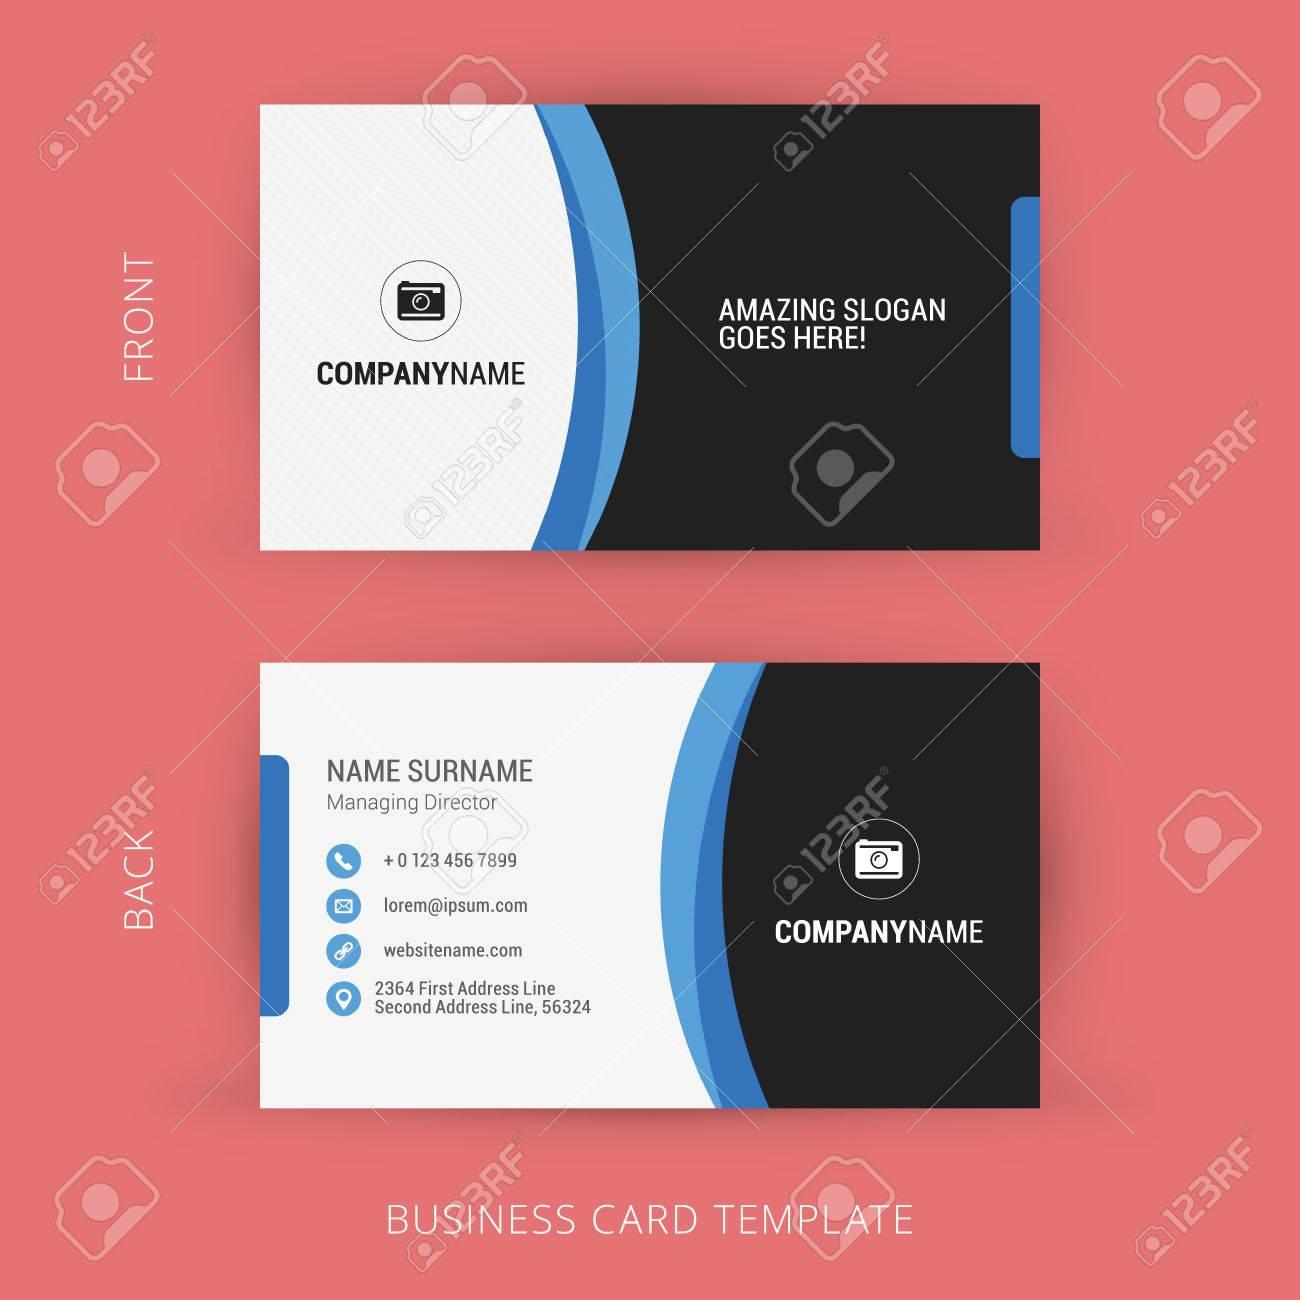 Modele De Carte Visite Creative Et Propre Couleurs Noir Bleu